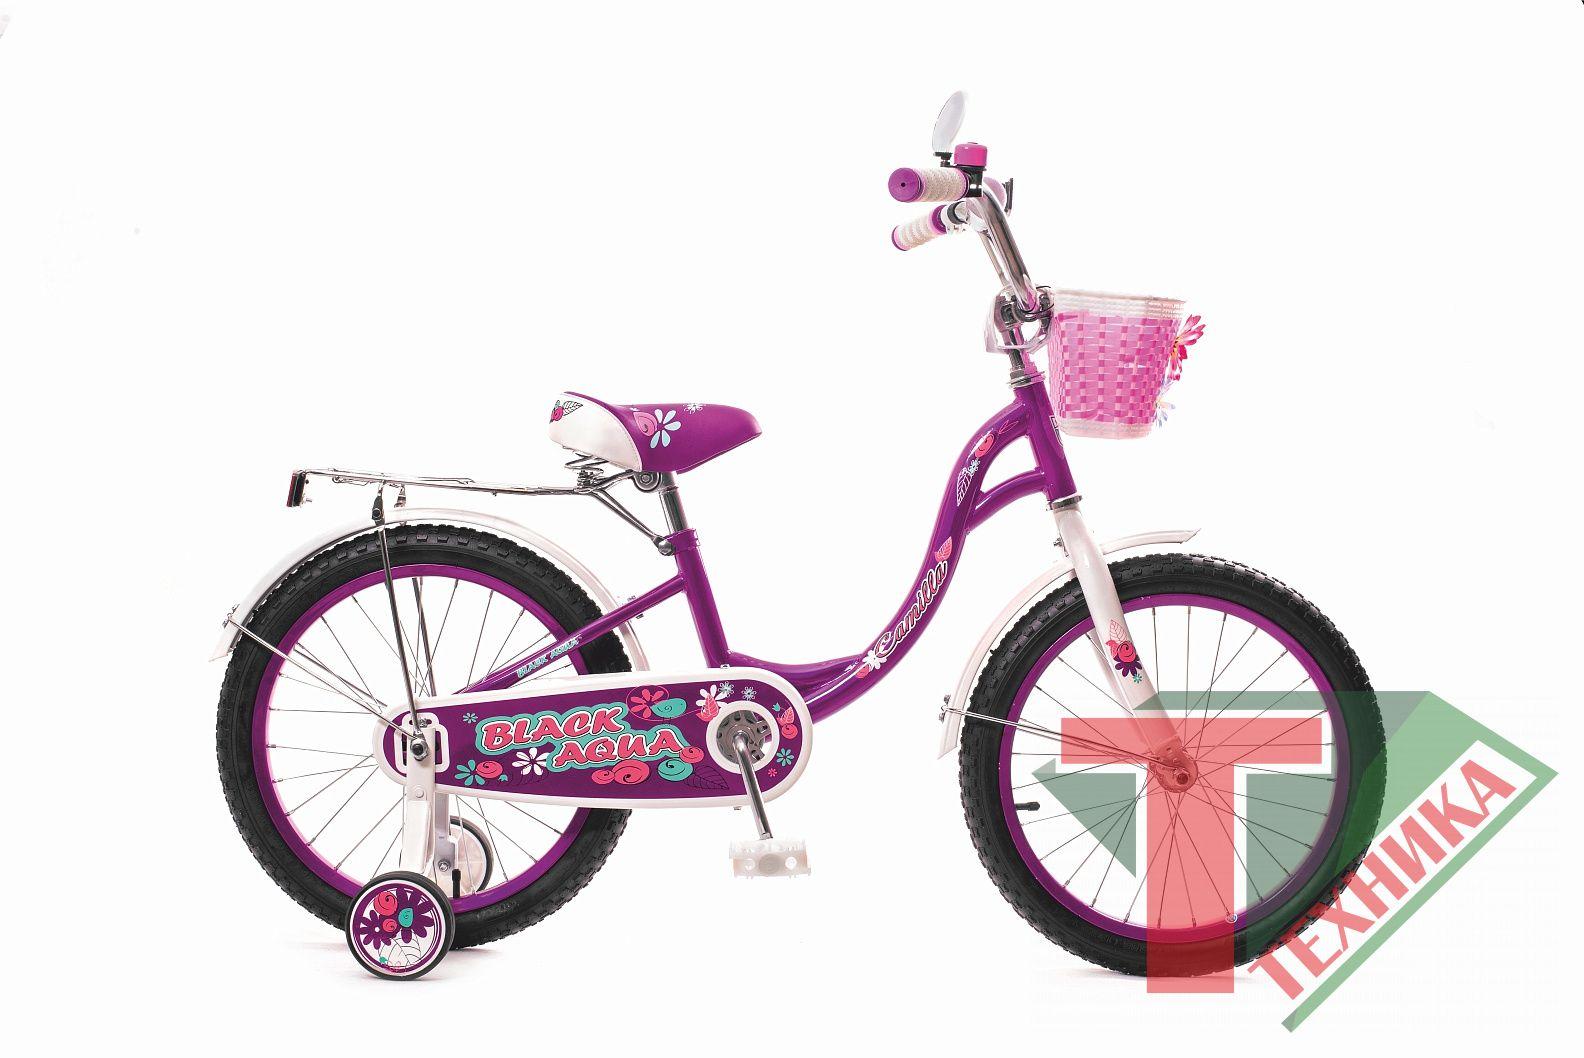 Велосипед KG1217 Black aqua Camilla 12